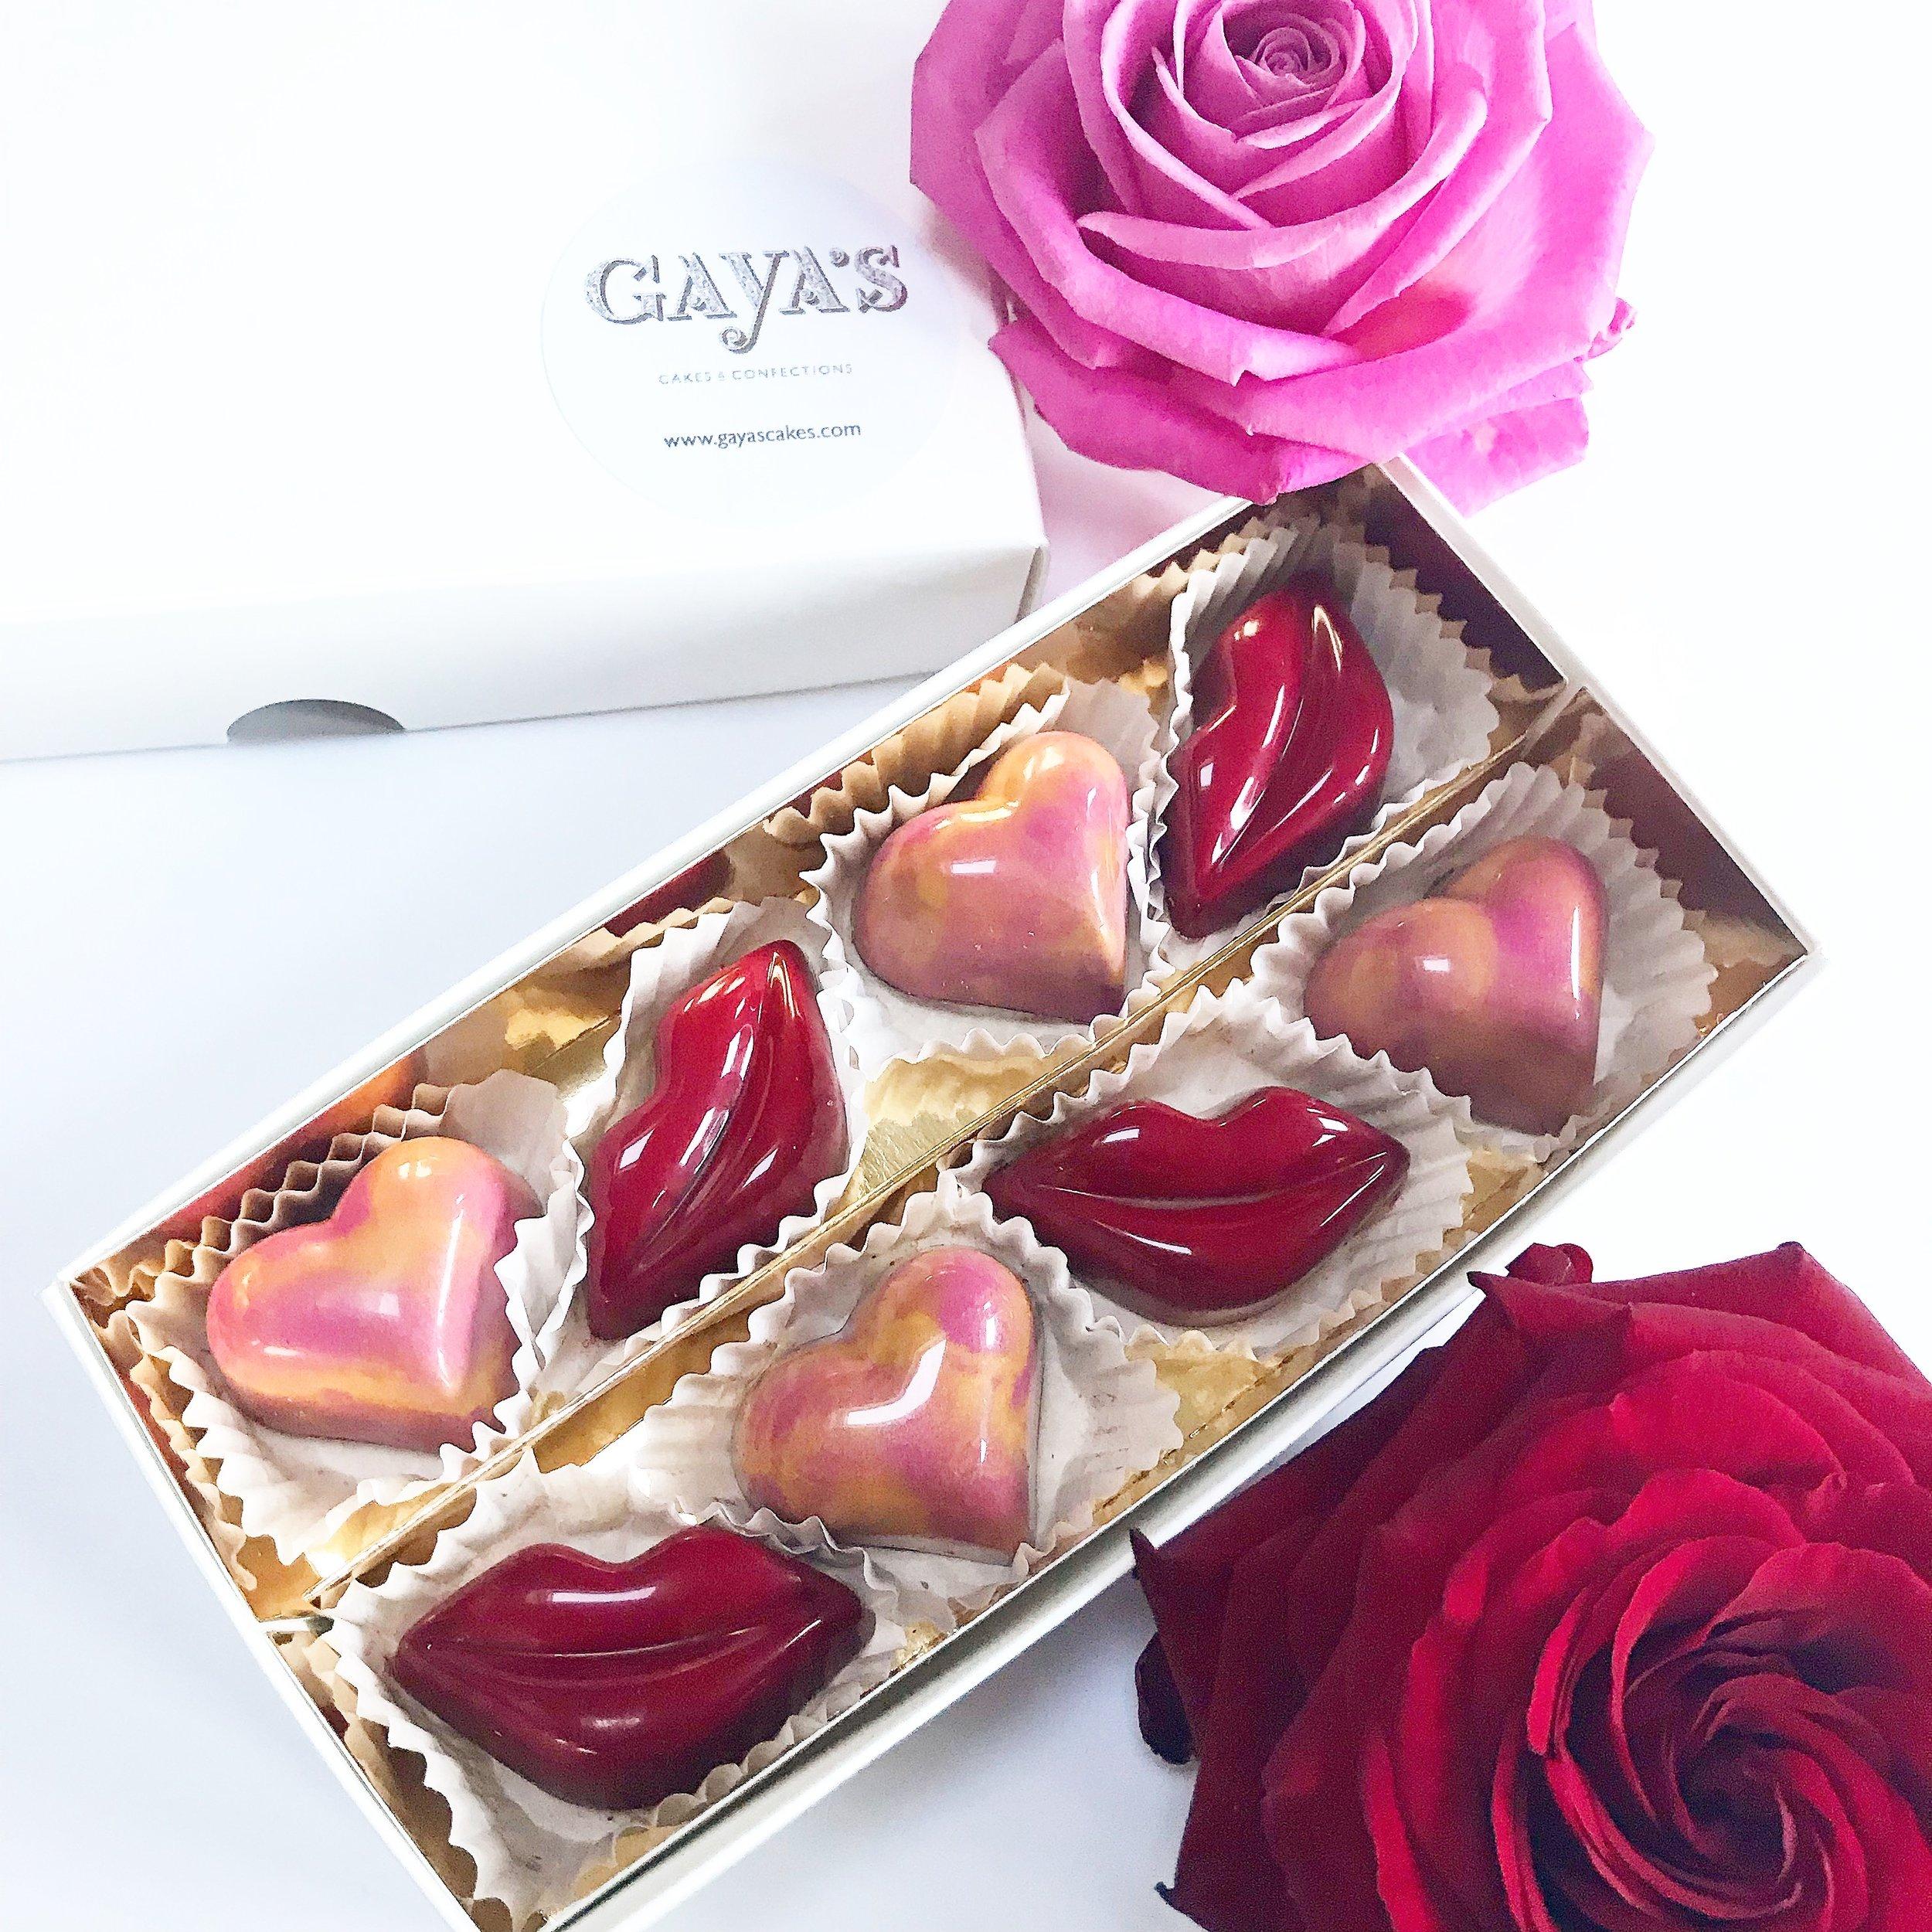 Alcohol free Valentine's Chocolate Bonbons.jpeg